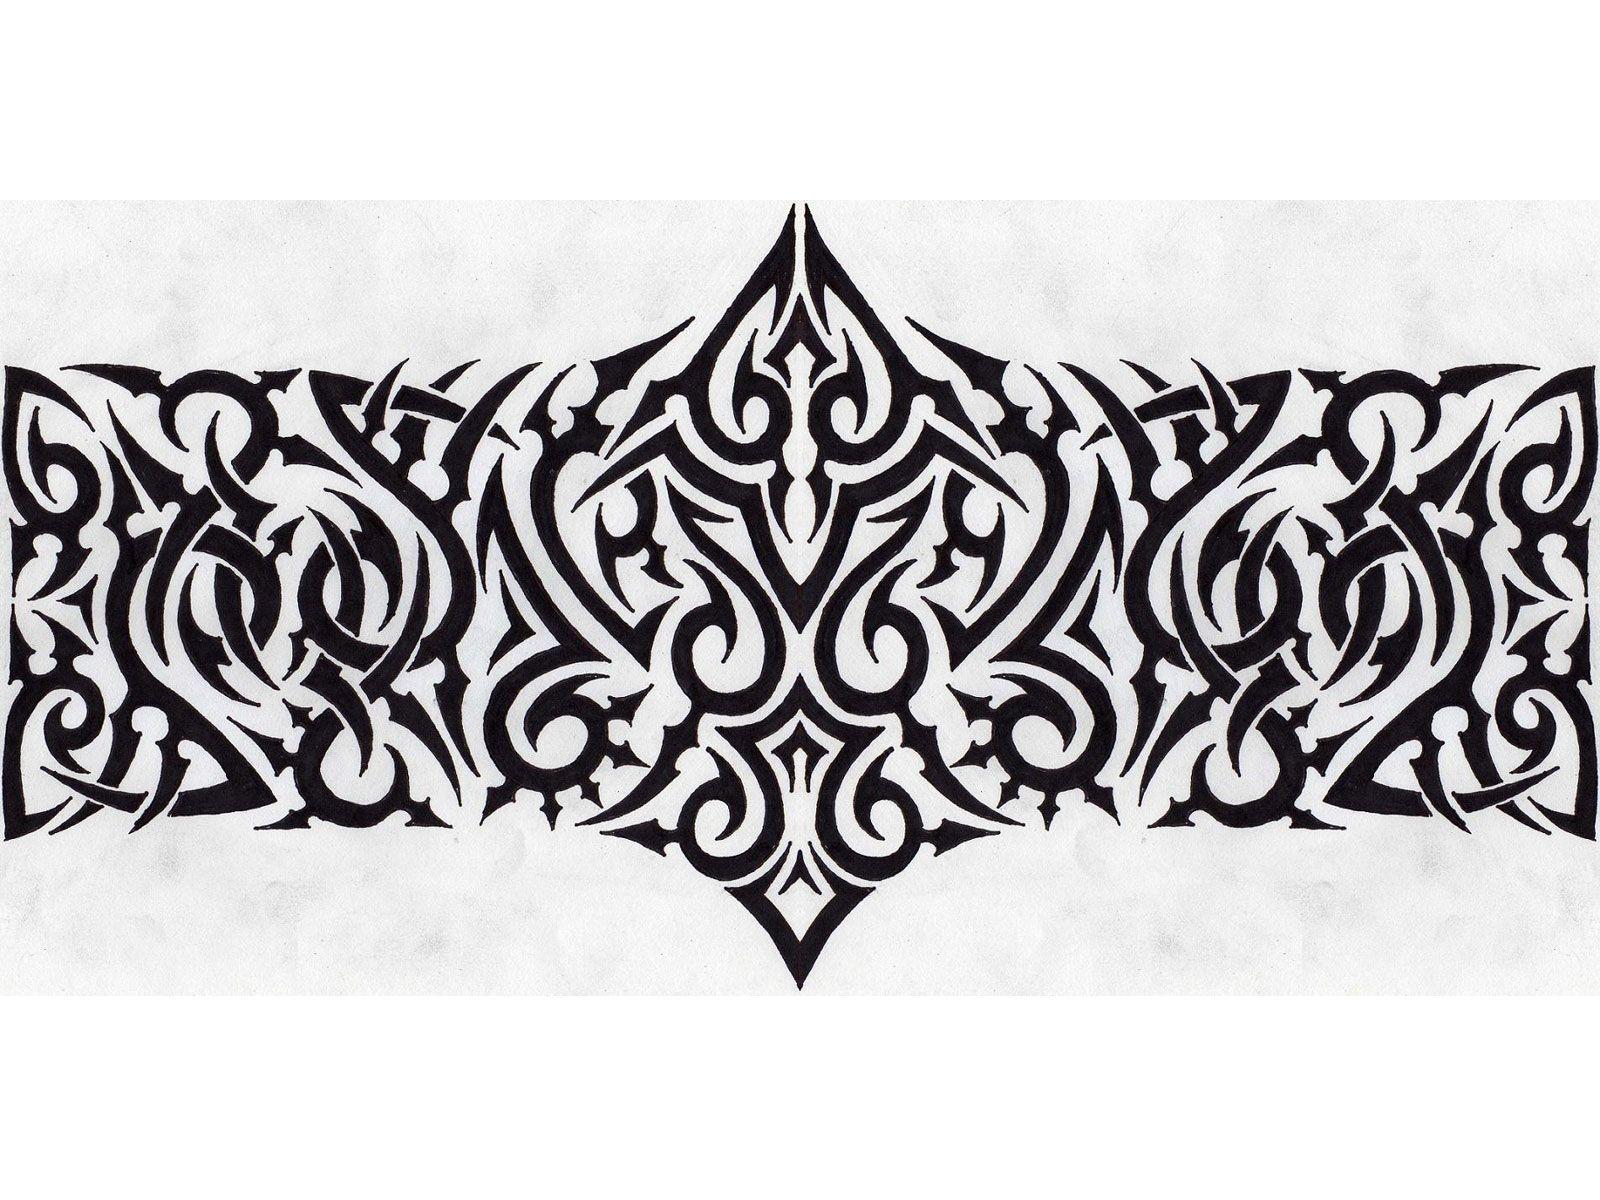 tribal armband tattoo designs possibility pinterest armband tattoo tribal armband tattoo. Black Bedroom Furniture Sets. Home Design Ideas